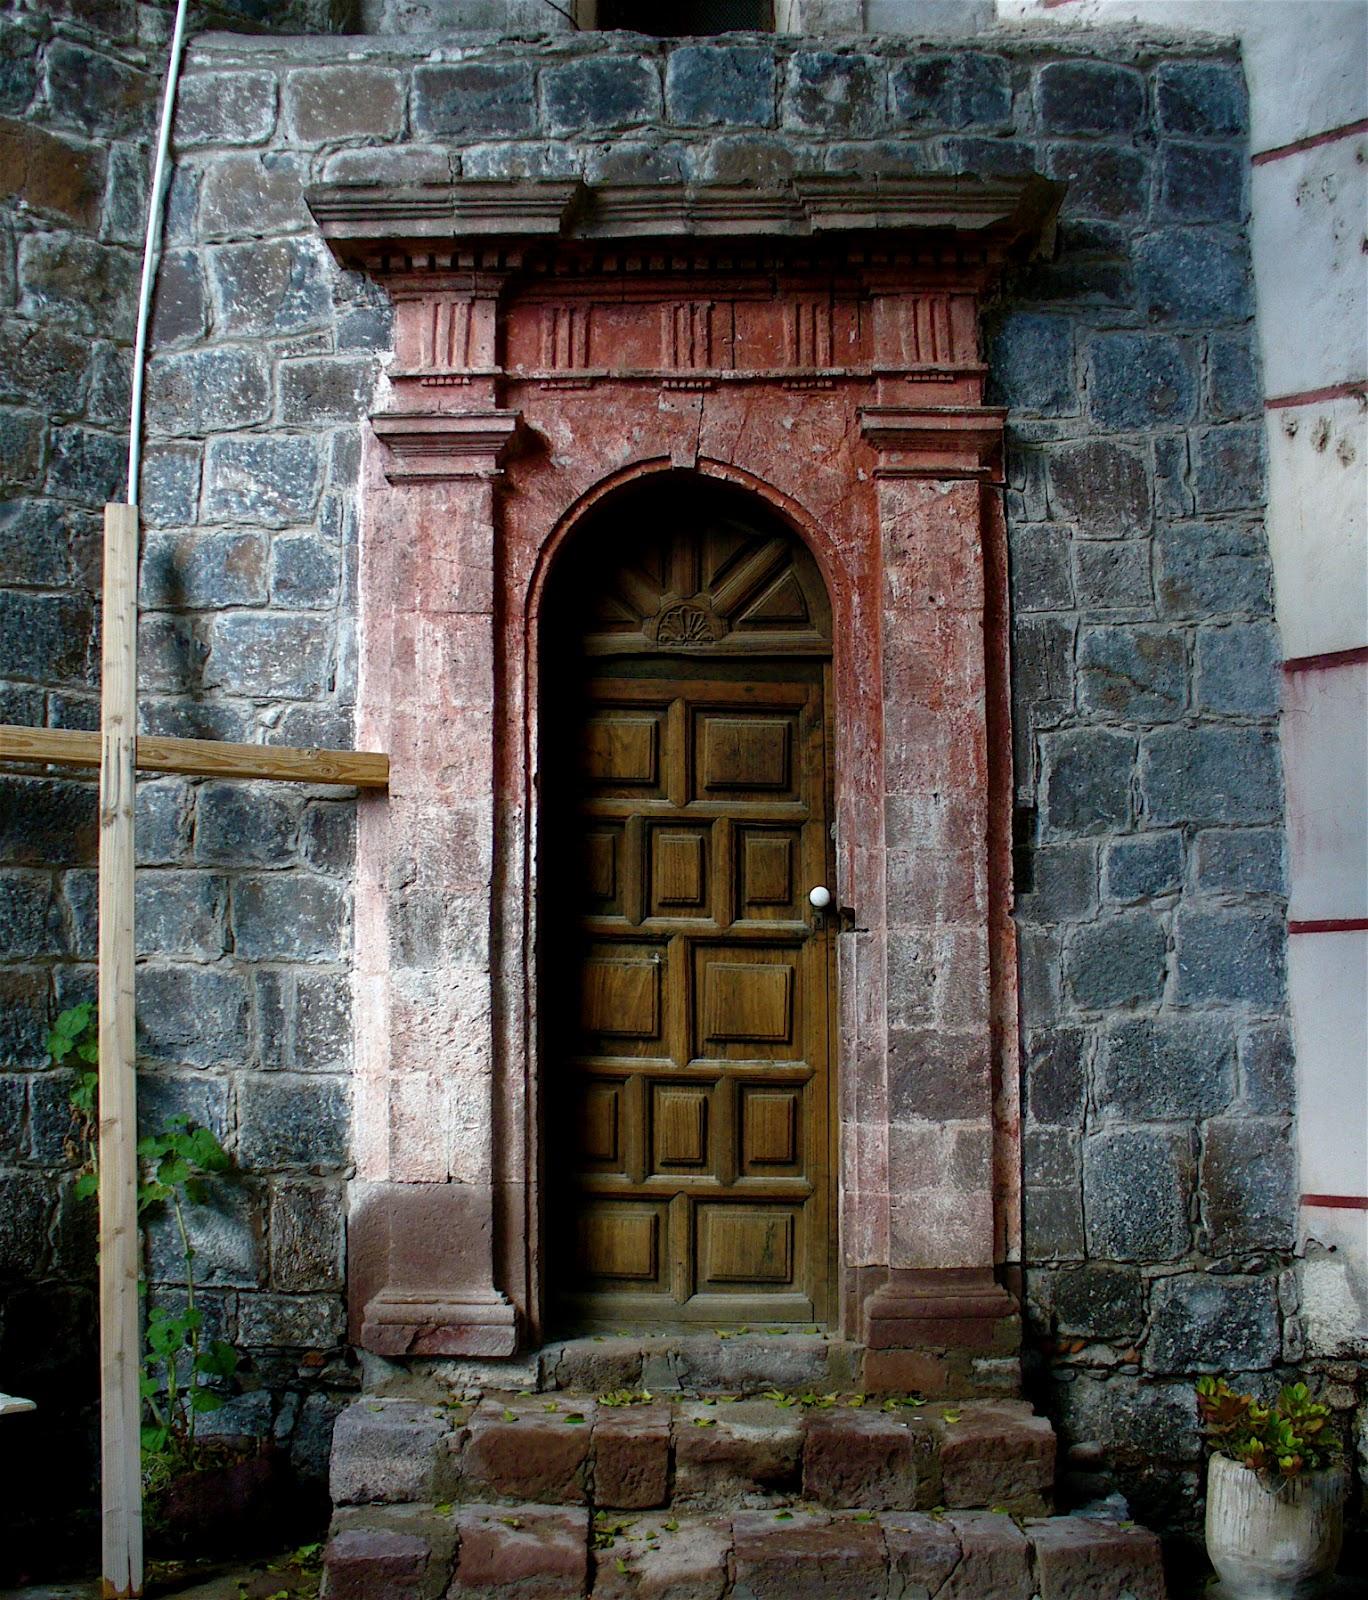 Doors And Windows At The Mission Of San Ignacio De Loyola In Baja California Sur & Alt. Build Blog: Doors And Windows At The Mission Of San Ignacio De ...